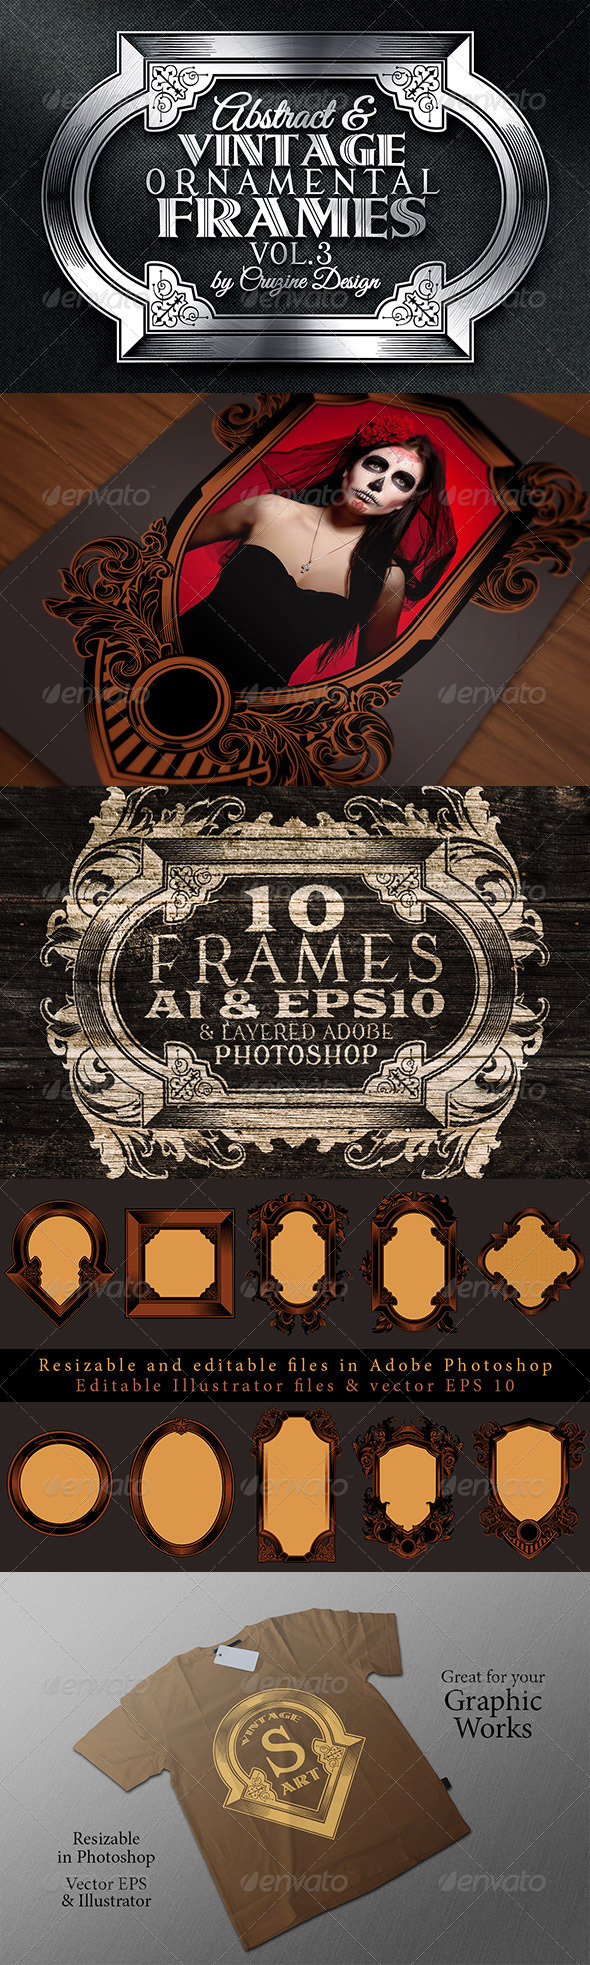 GraphicRiver 10 Frames Vol.3 Vintage Ornament 6320133